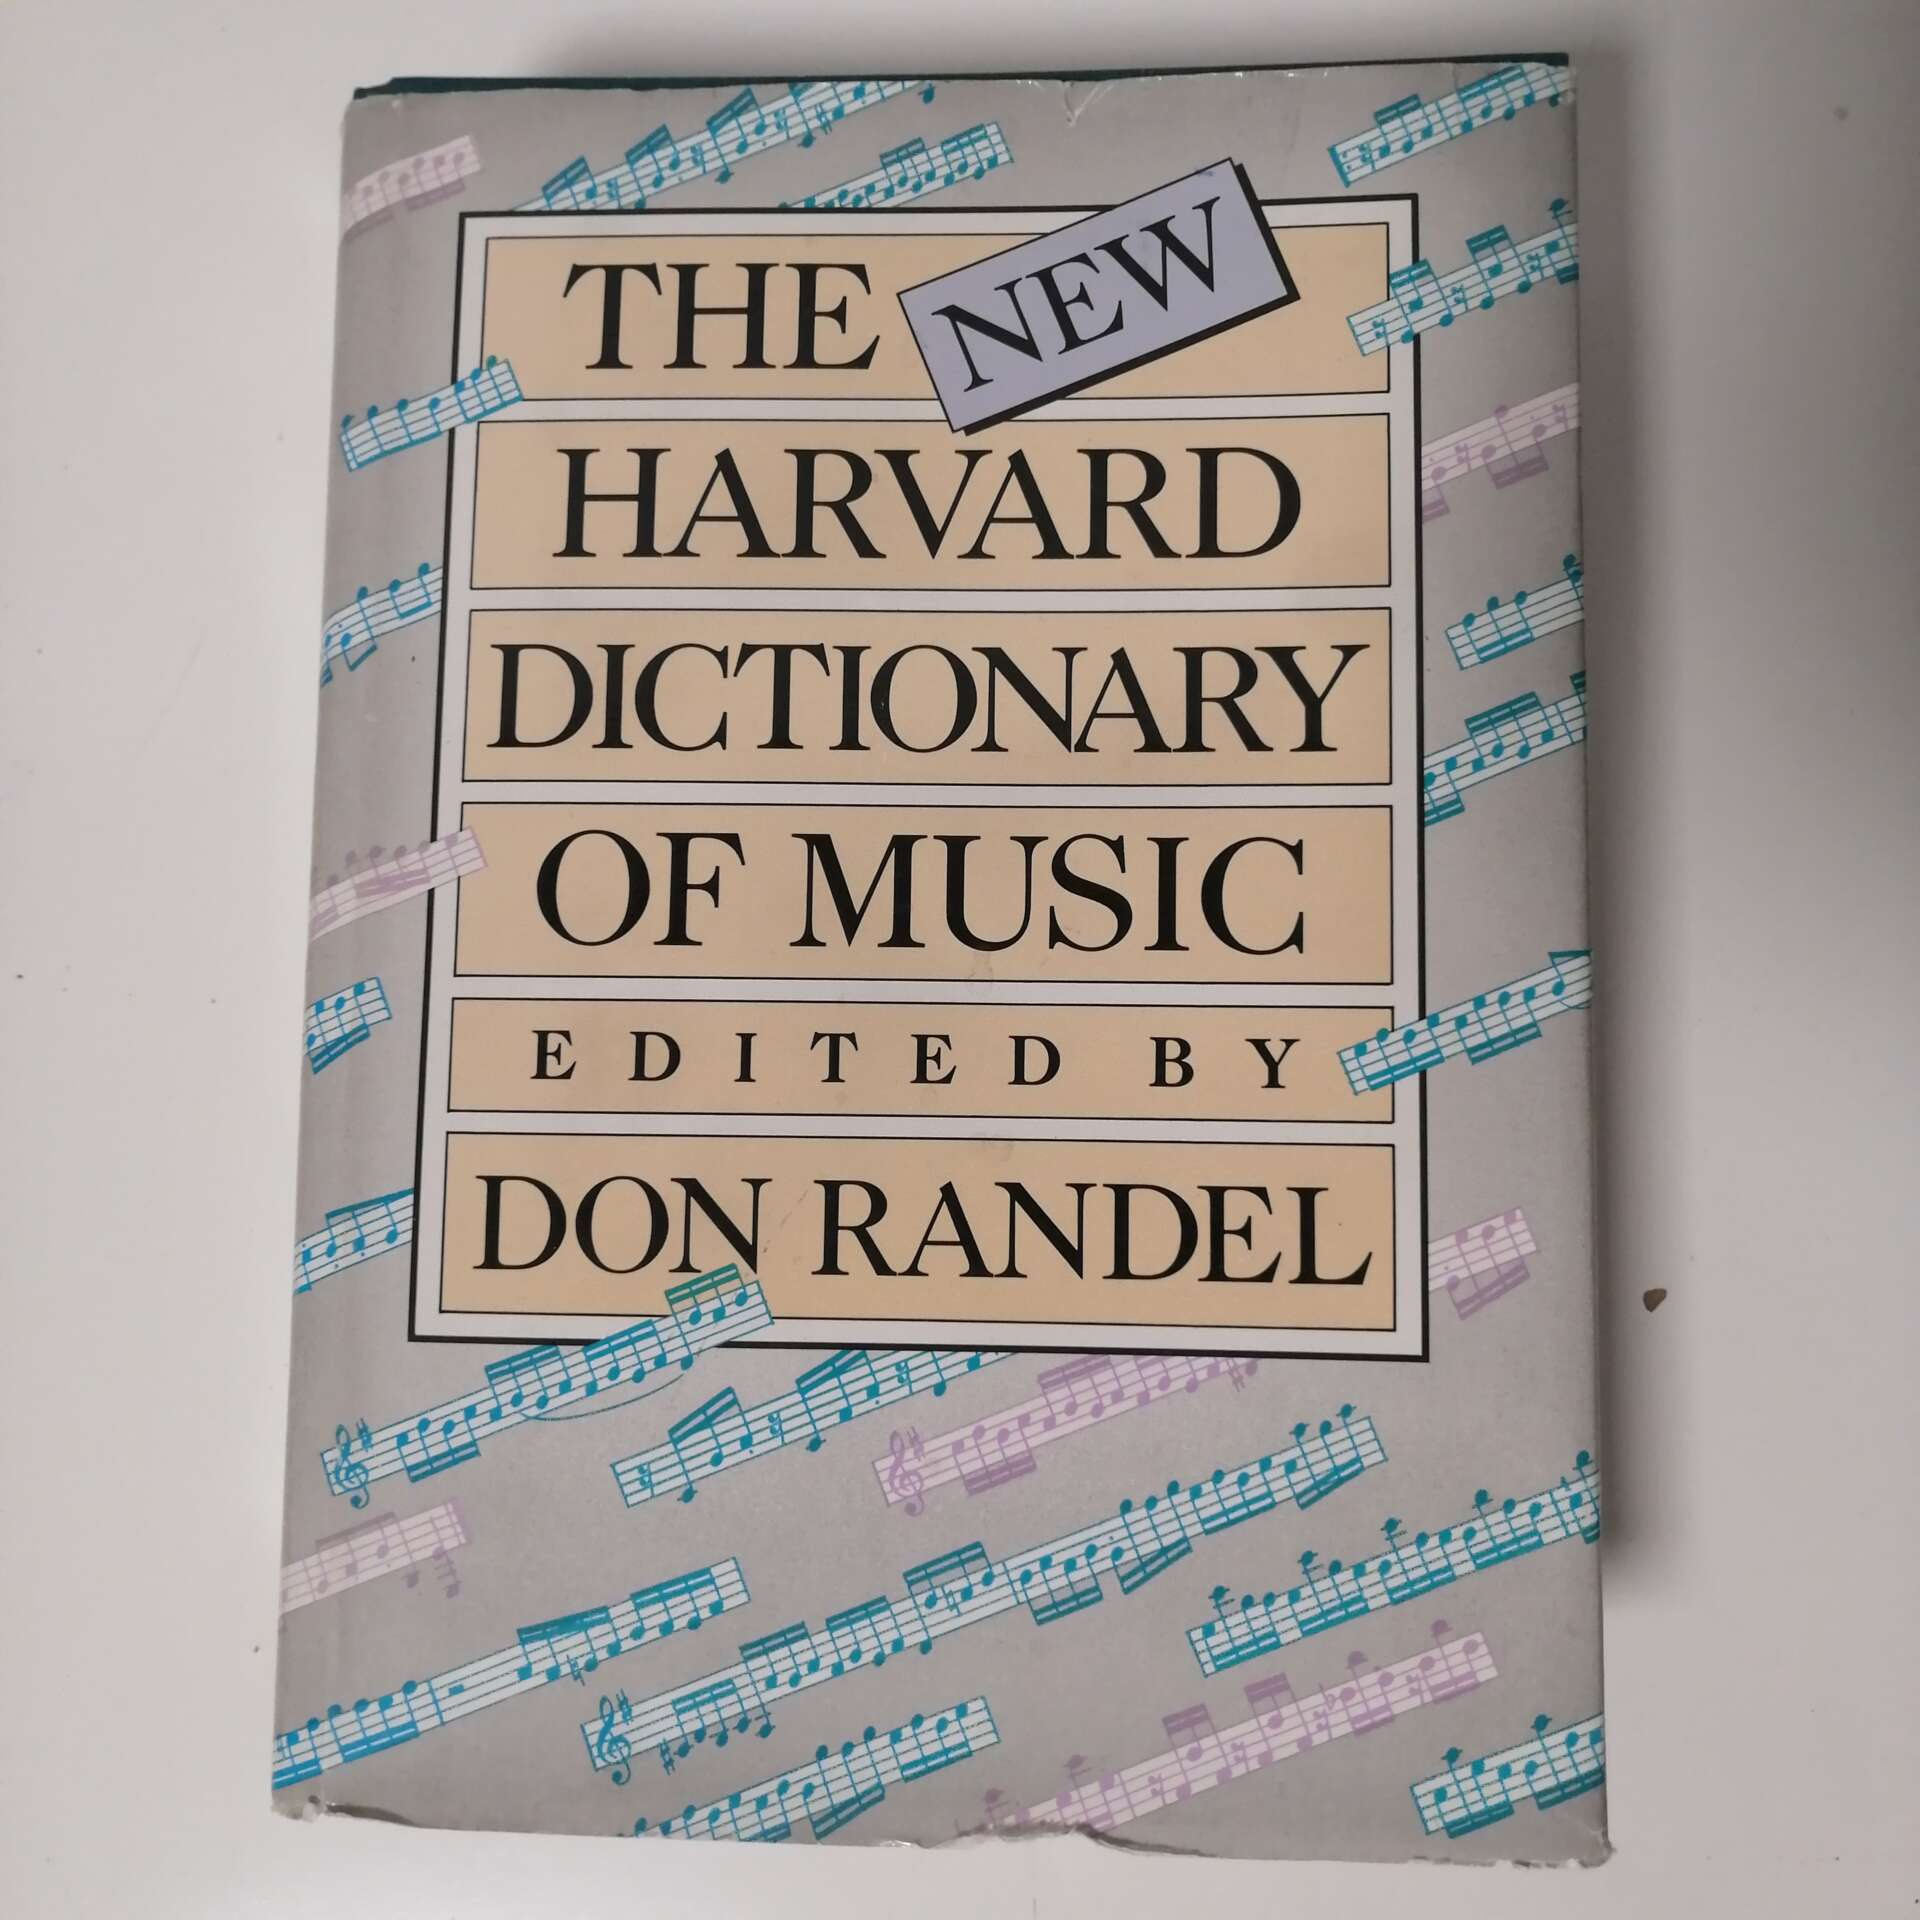 Harvard dictionary of music